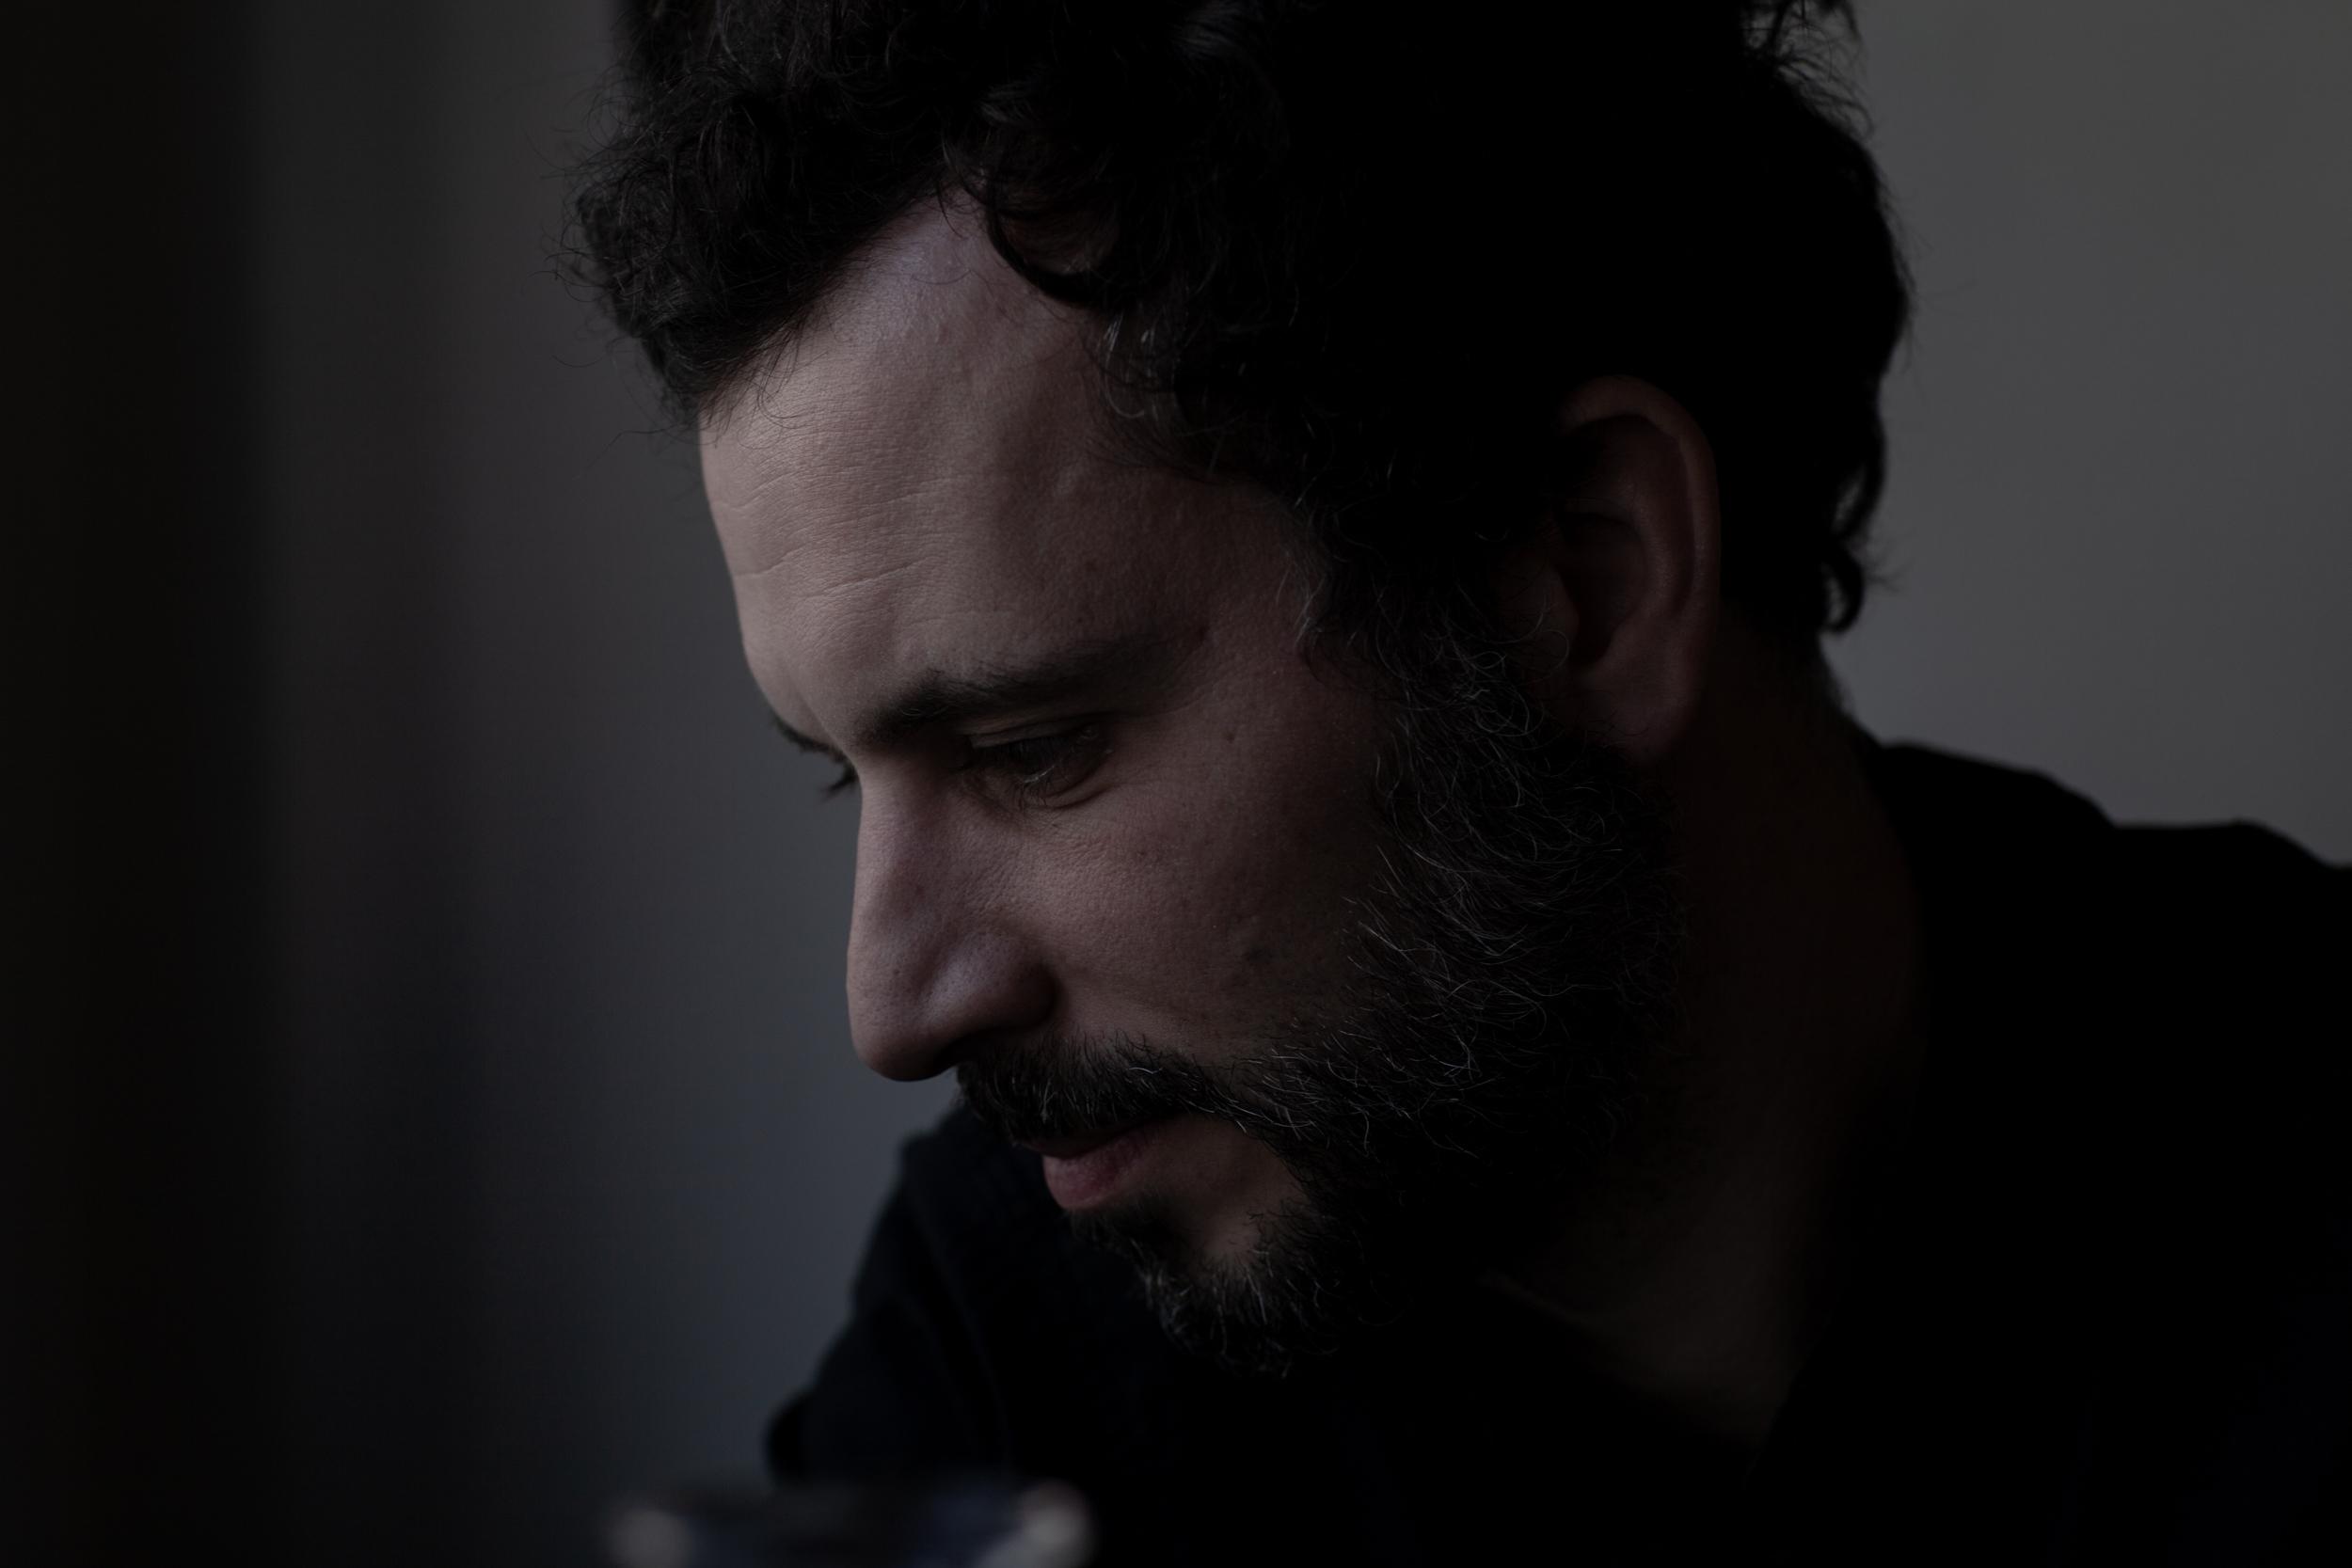 Artist, Musician, Writer, Editor | Christophe Amblard | Paris, France